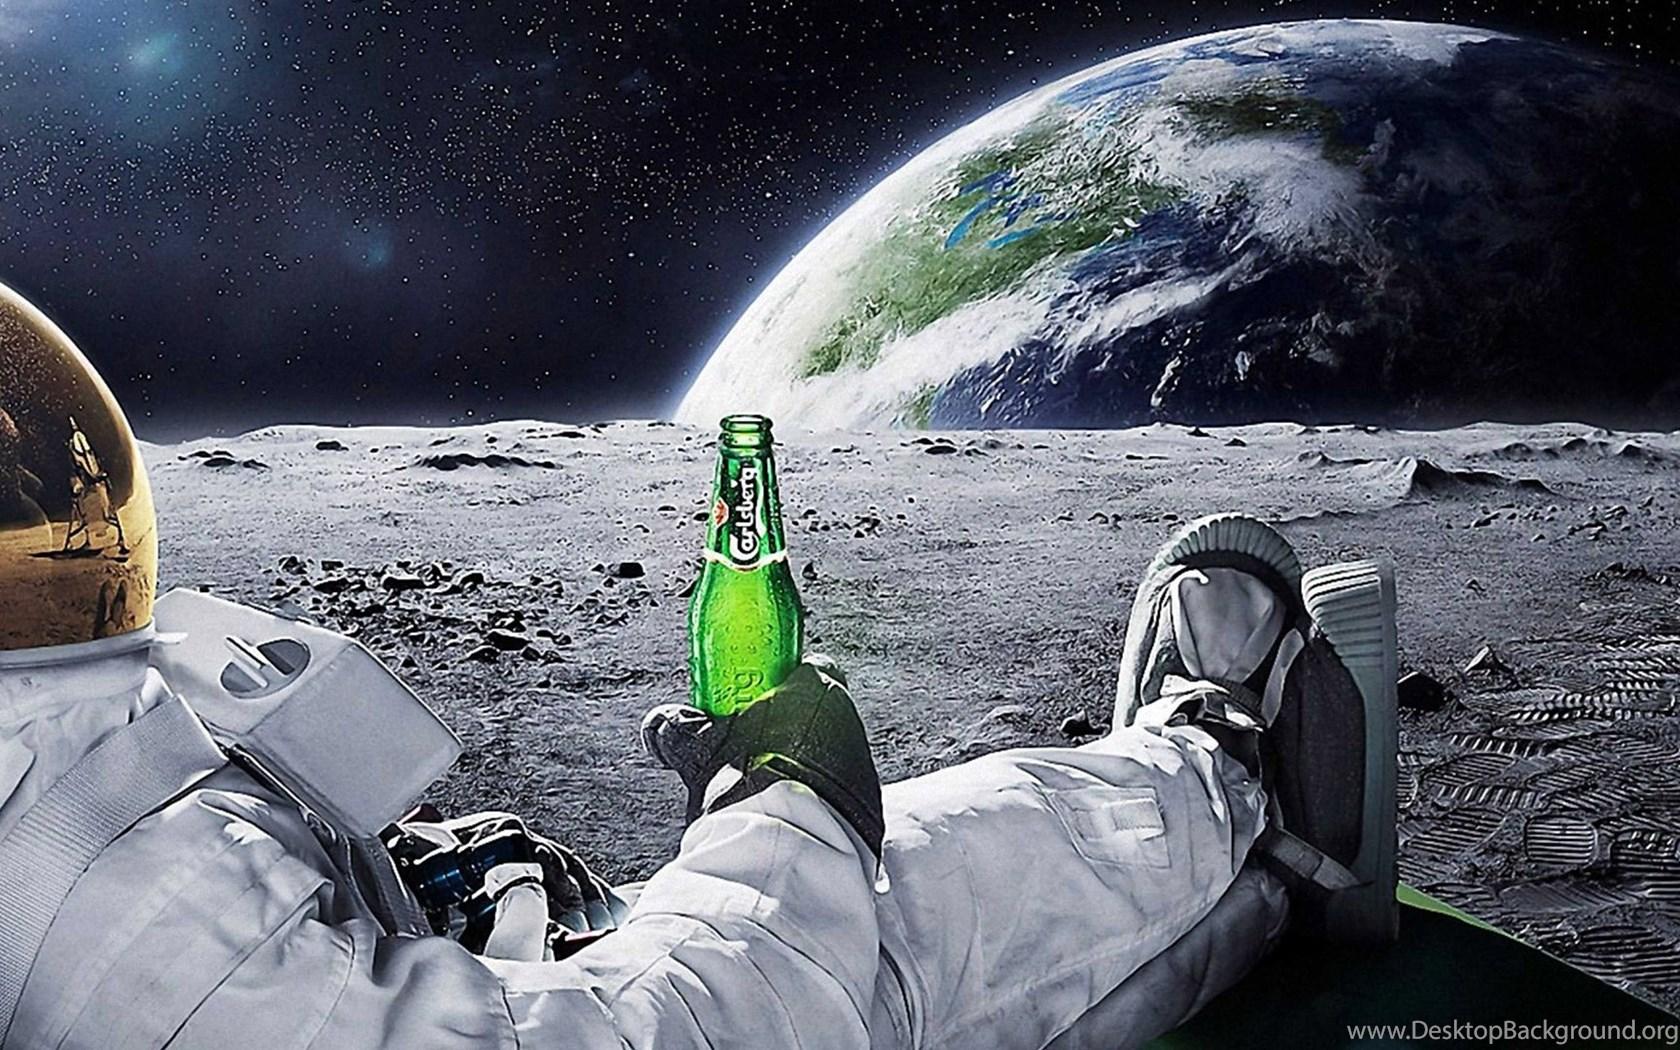 Bro Code Beer Hd Wallpaper: Astronaut Drinking Carlsberg Beer Moon Space Wallpapers